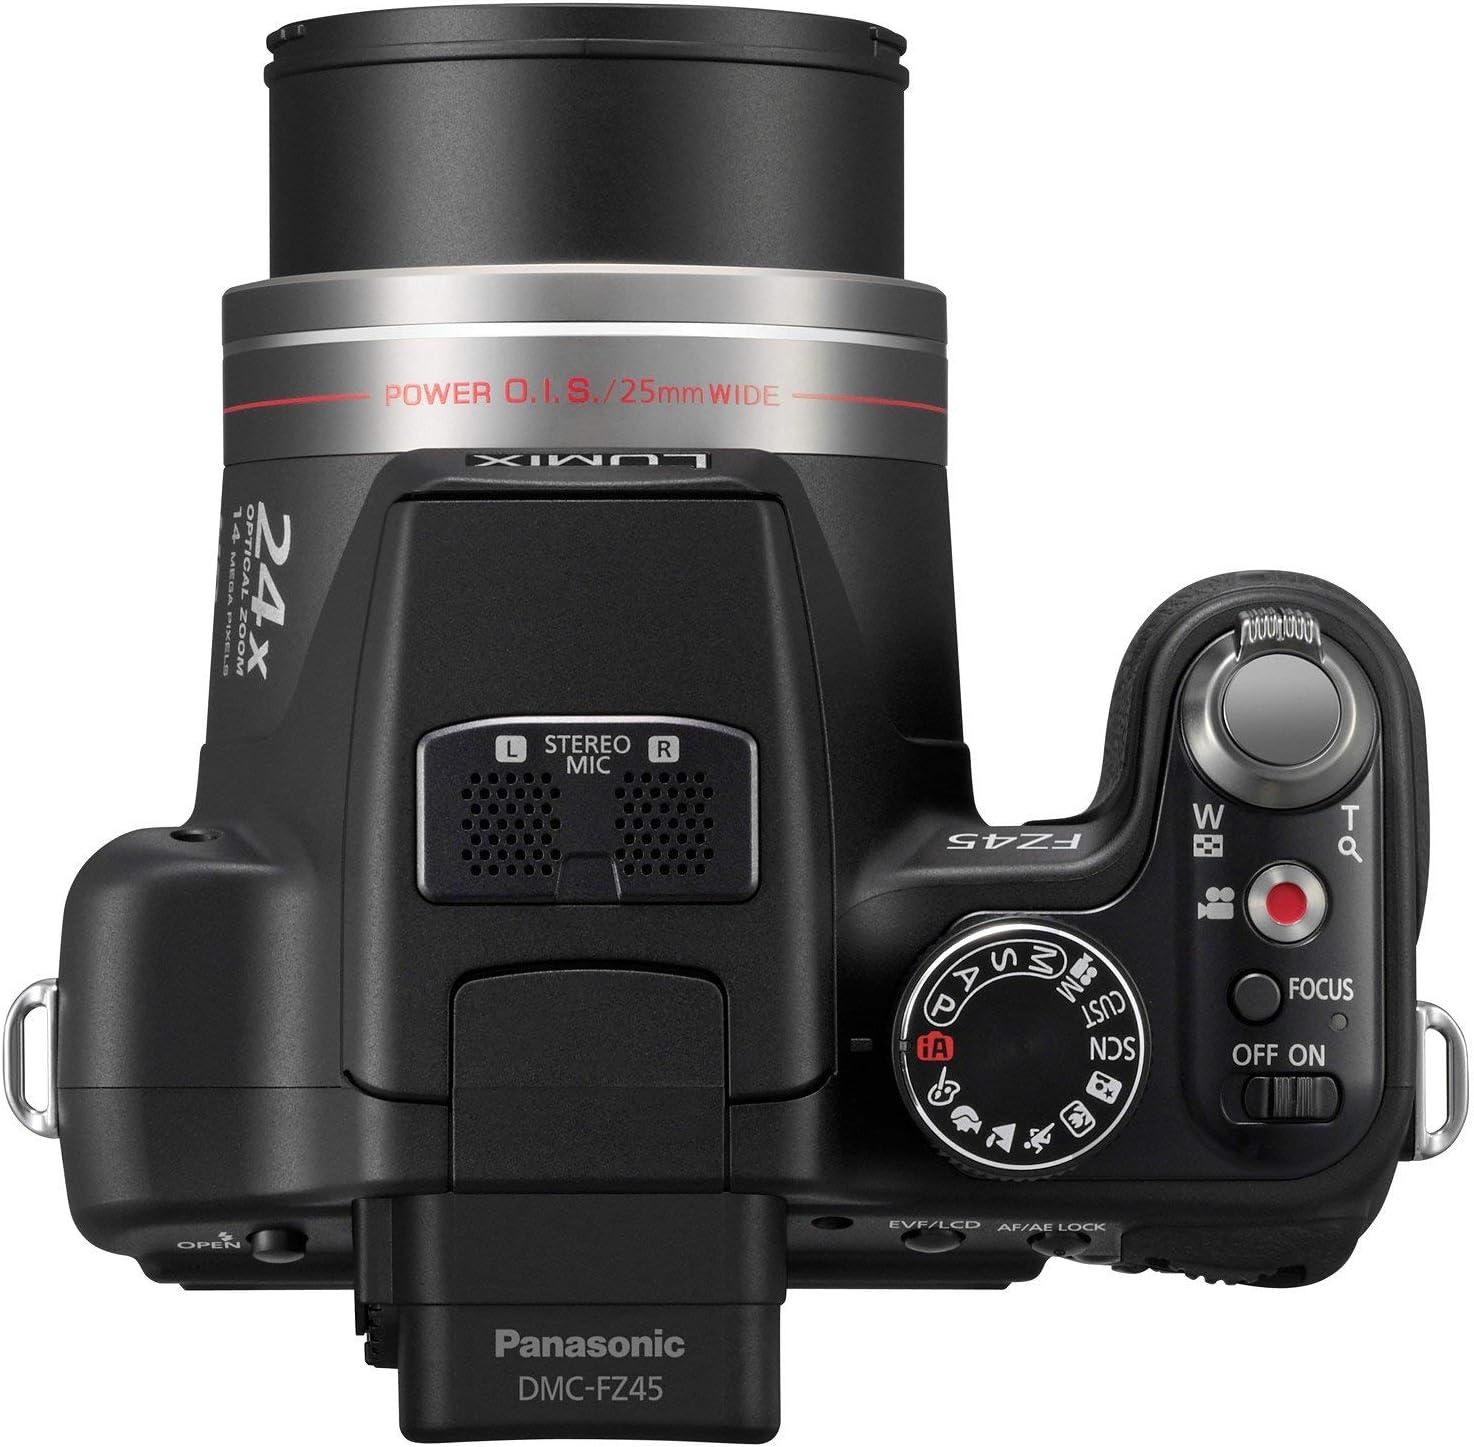 Panasonic Lumix Dmc Fz45eg K Digitalkamera 3 Zoll Kamera